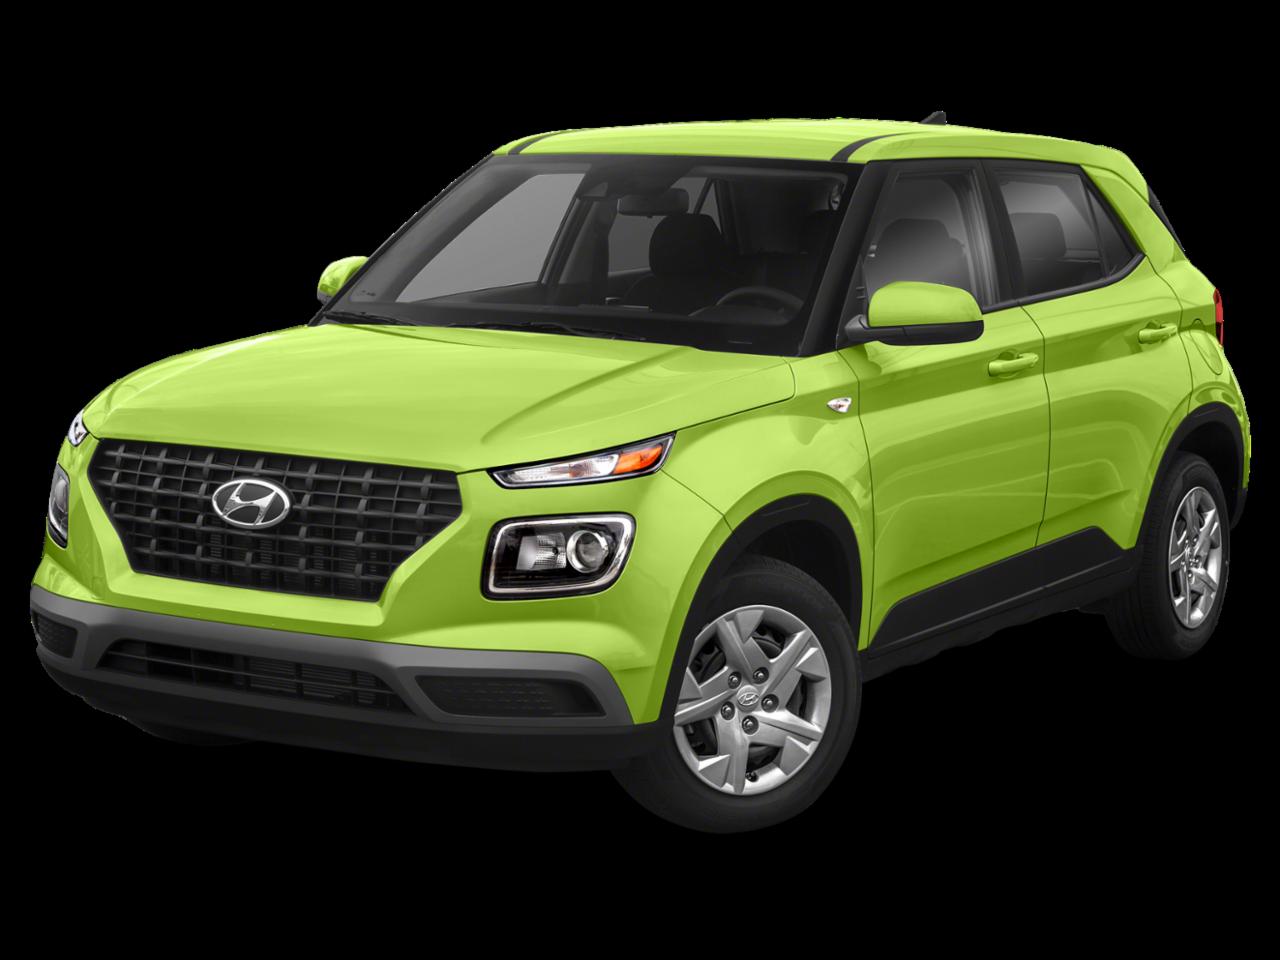 Hyundai 2020 Venue SE